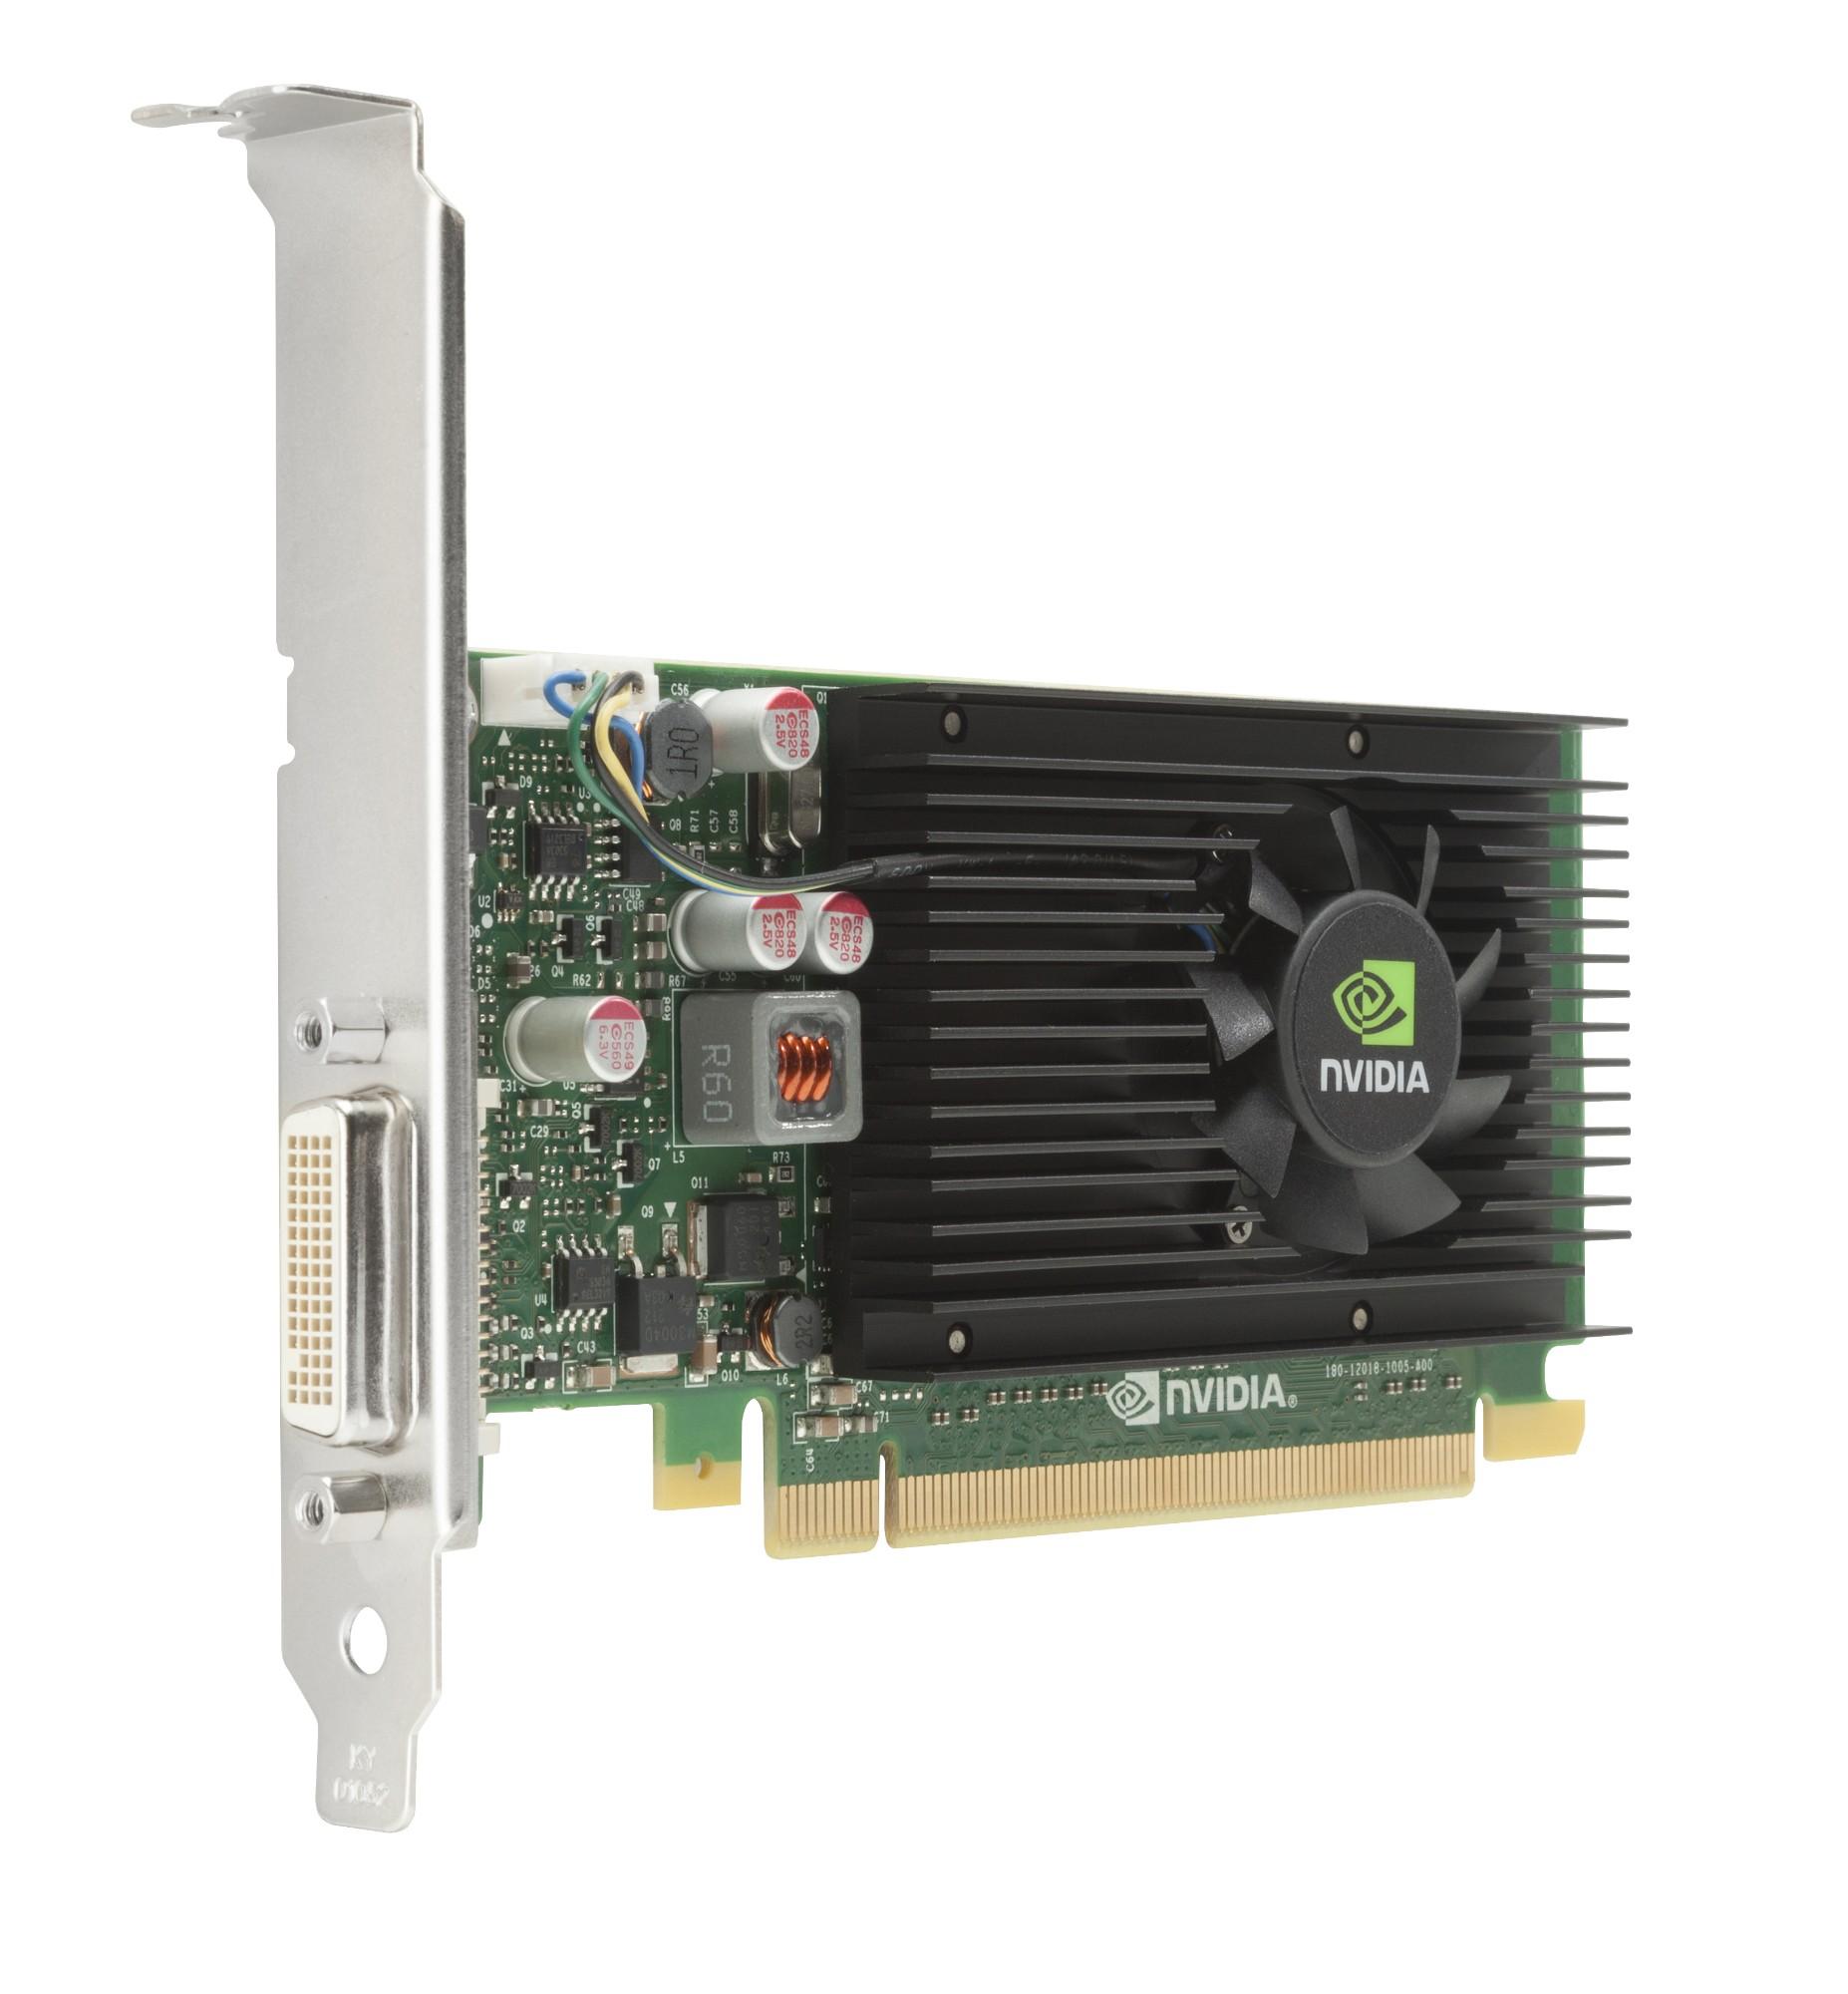 HP NVIDIA NVS 315 1GB Graphics Card